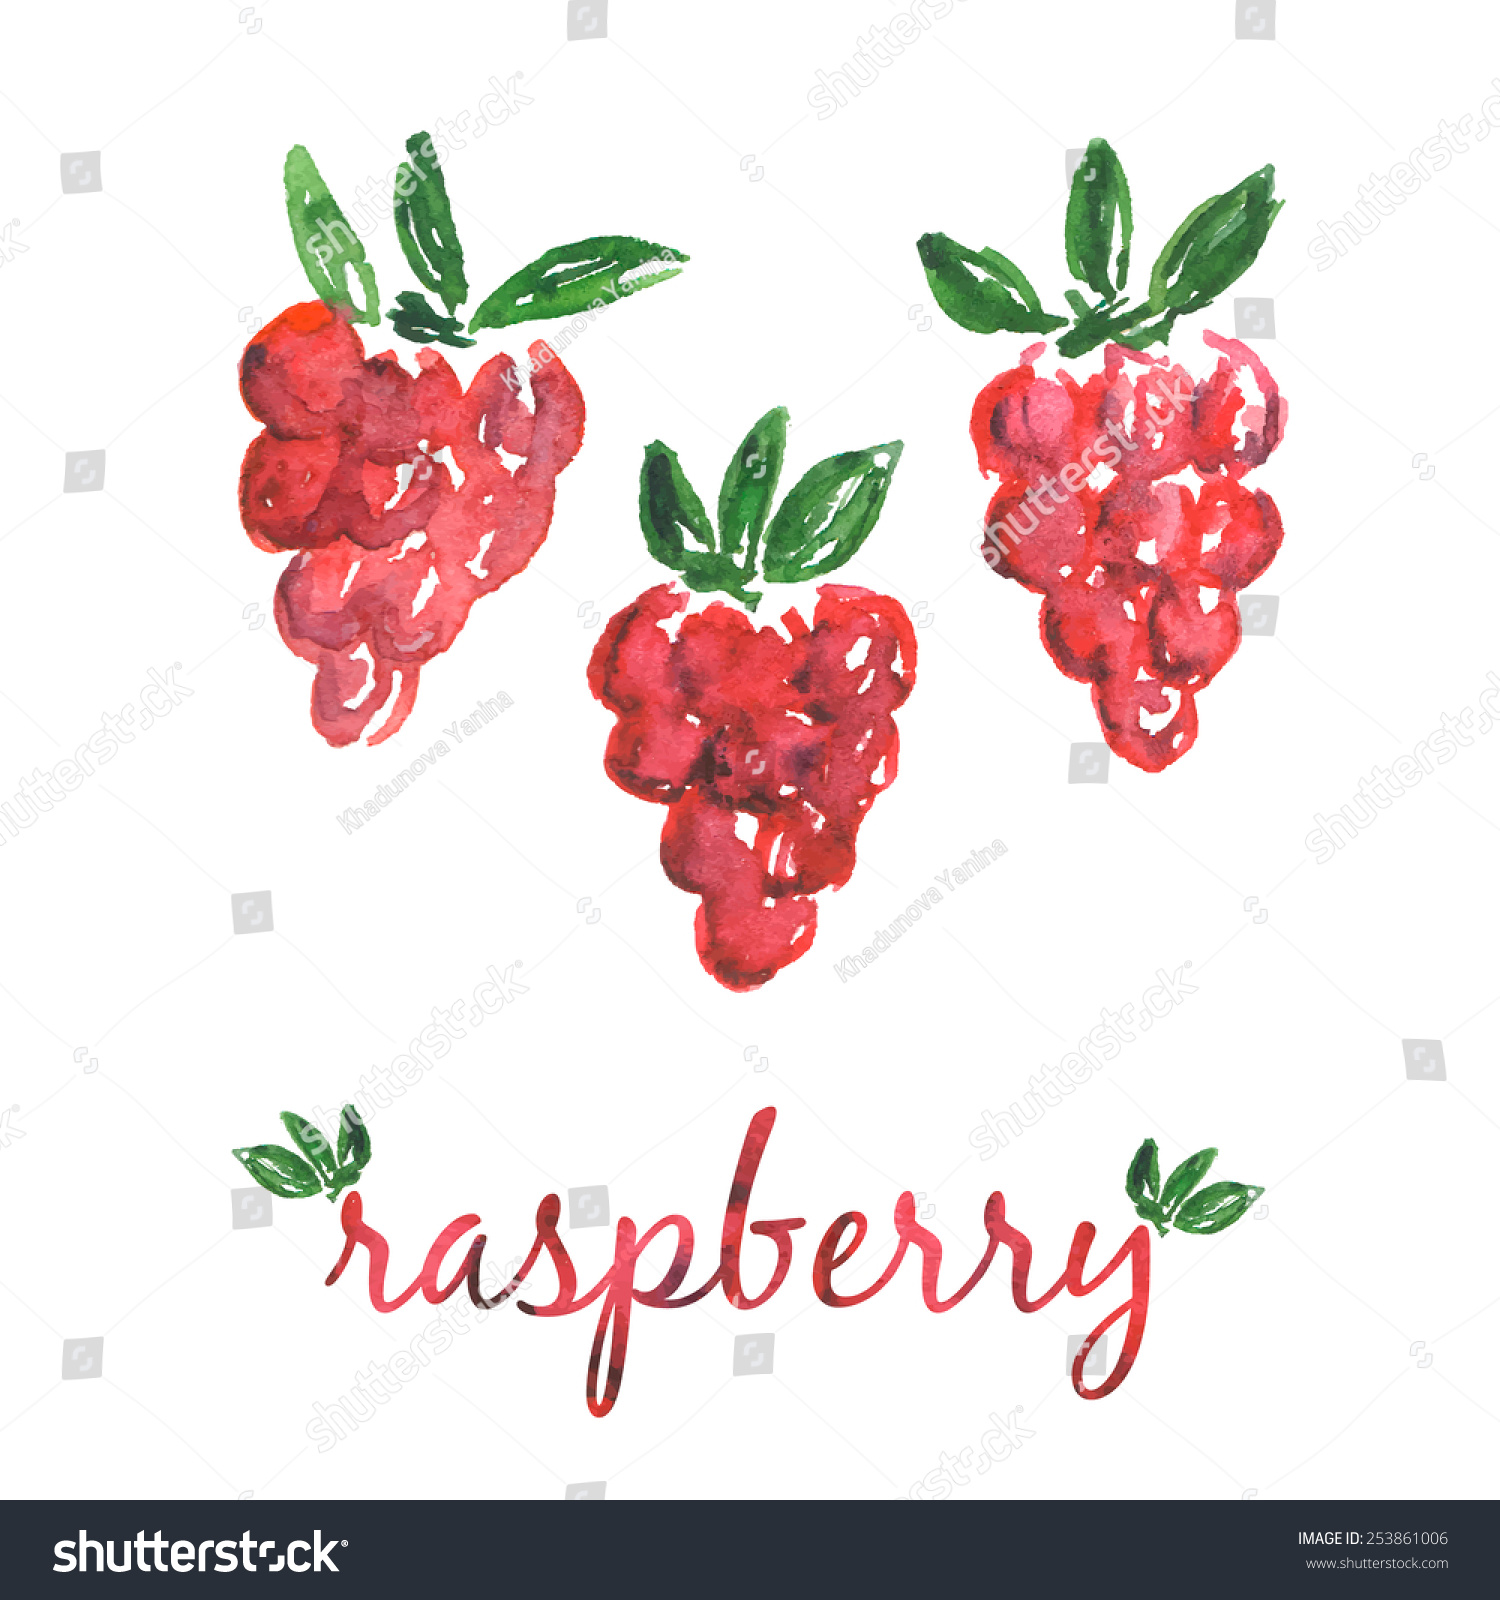 Watercolor Handdrawn Invitationgreeting Card Raspberry Stock Vector